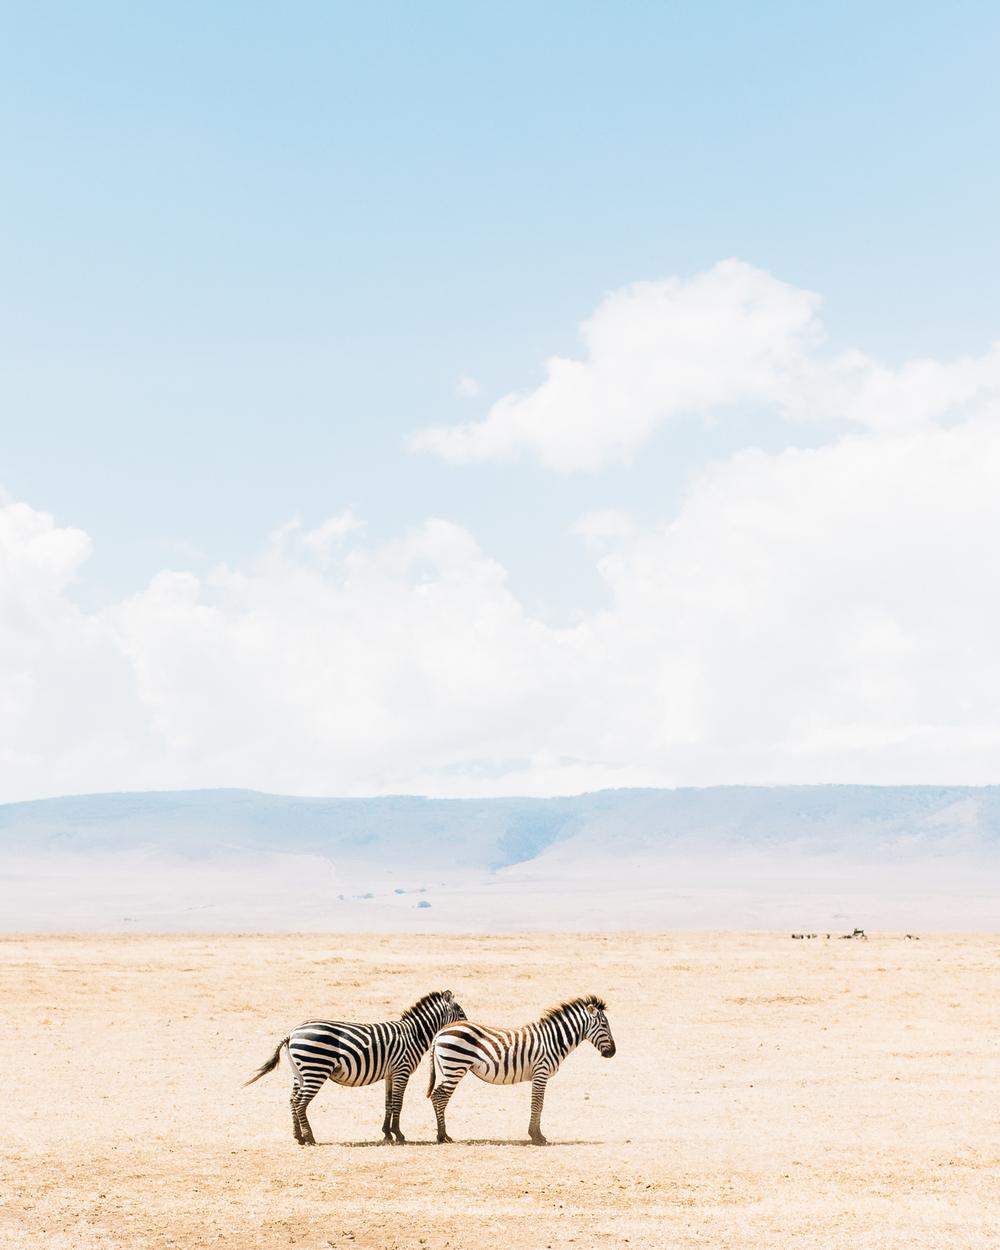 cameron-zegers-photography-tanzania-travel-zebras-1.jpg